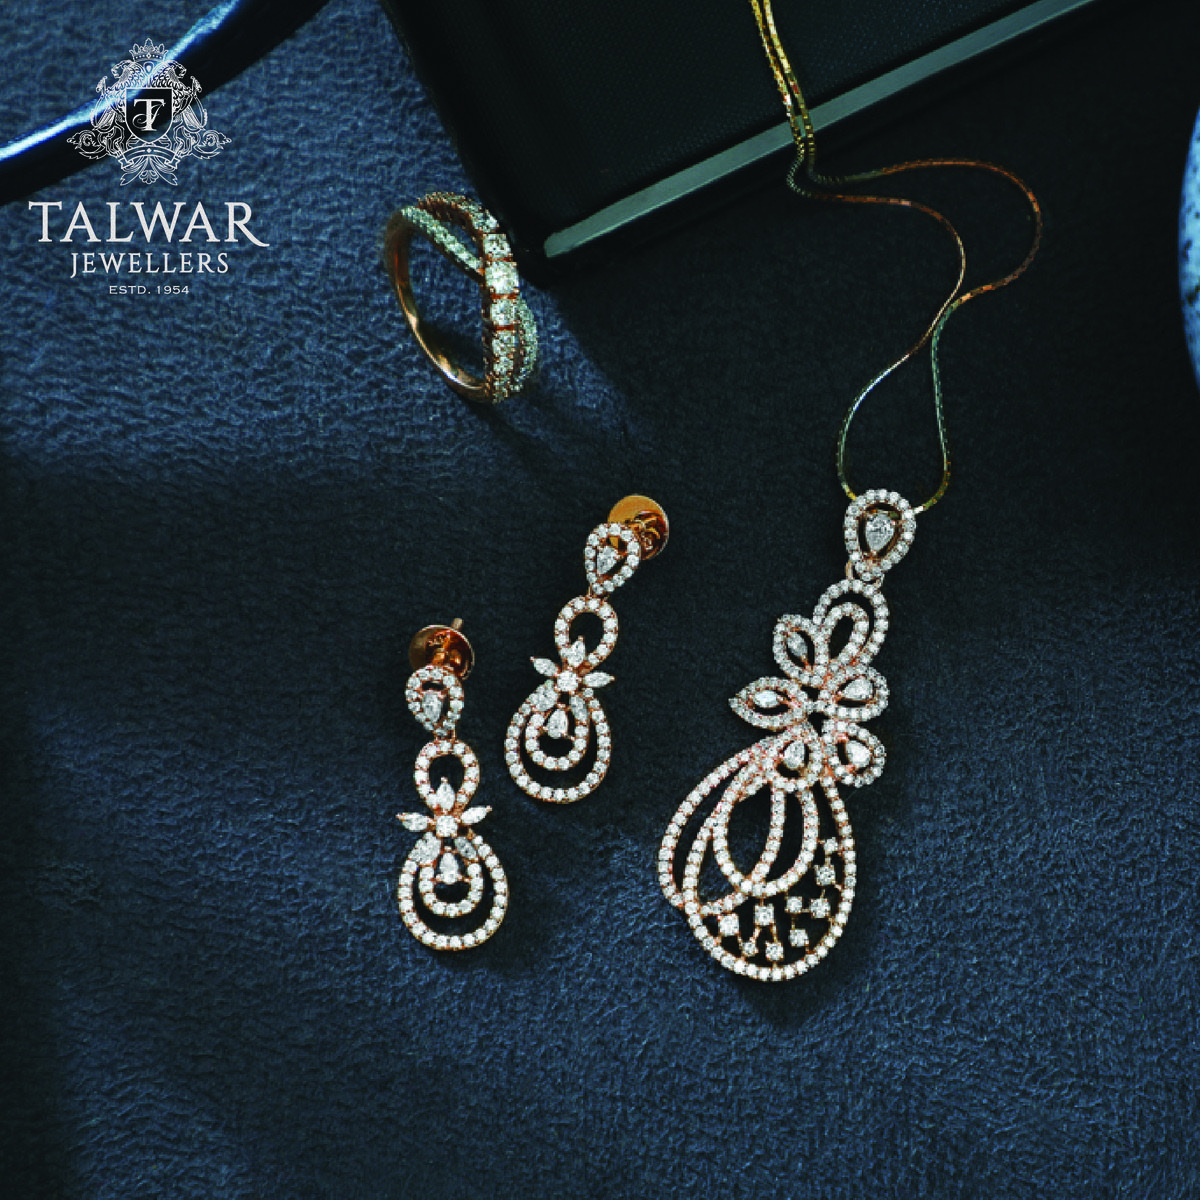 Pin by khuzaima zaveri on pendents pinterest diamond pendants